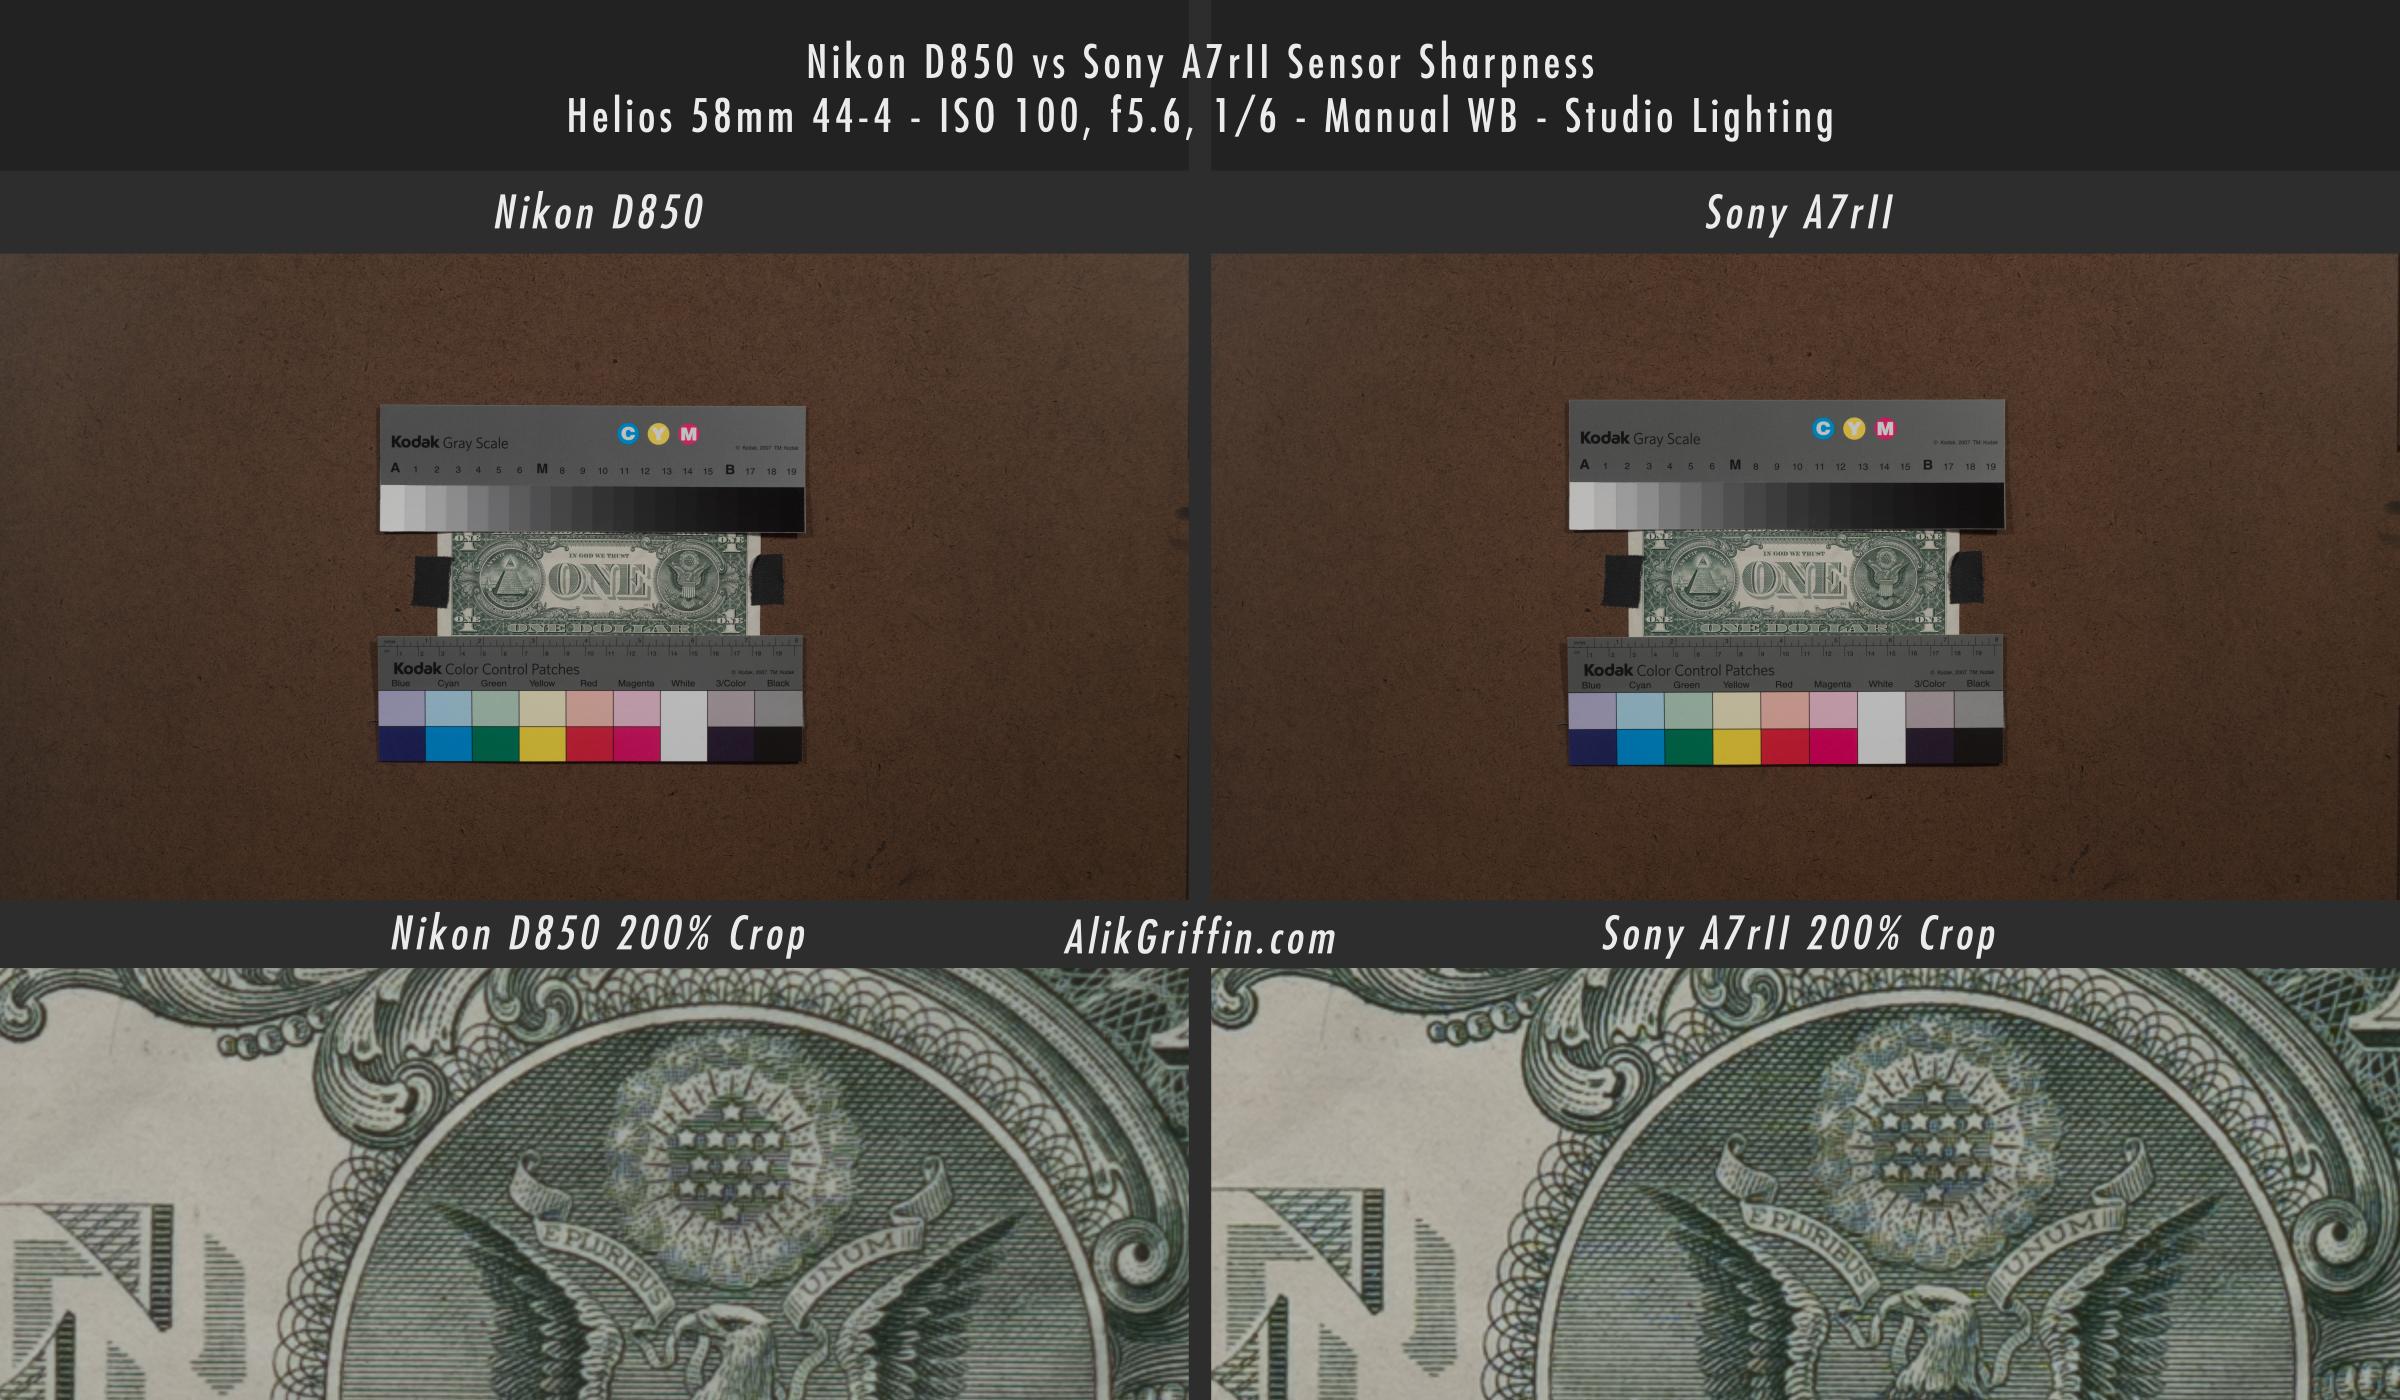 Nikon D850 vs Sony A7rII Sensor Sharpness Comparison